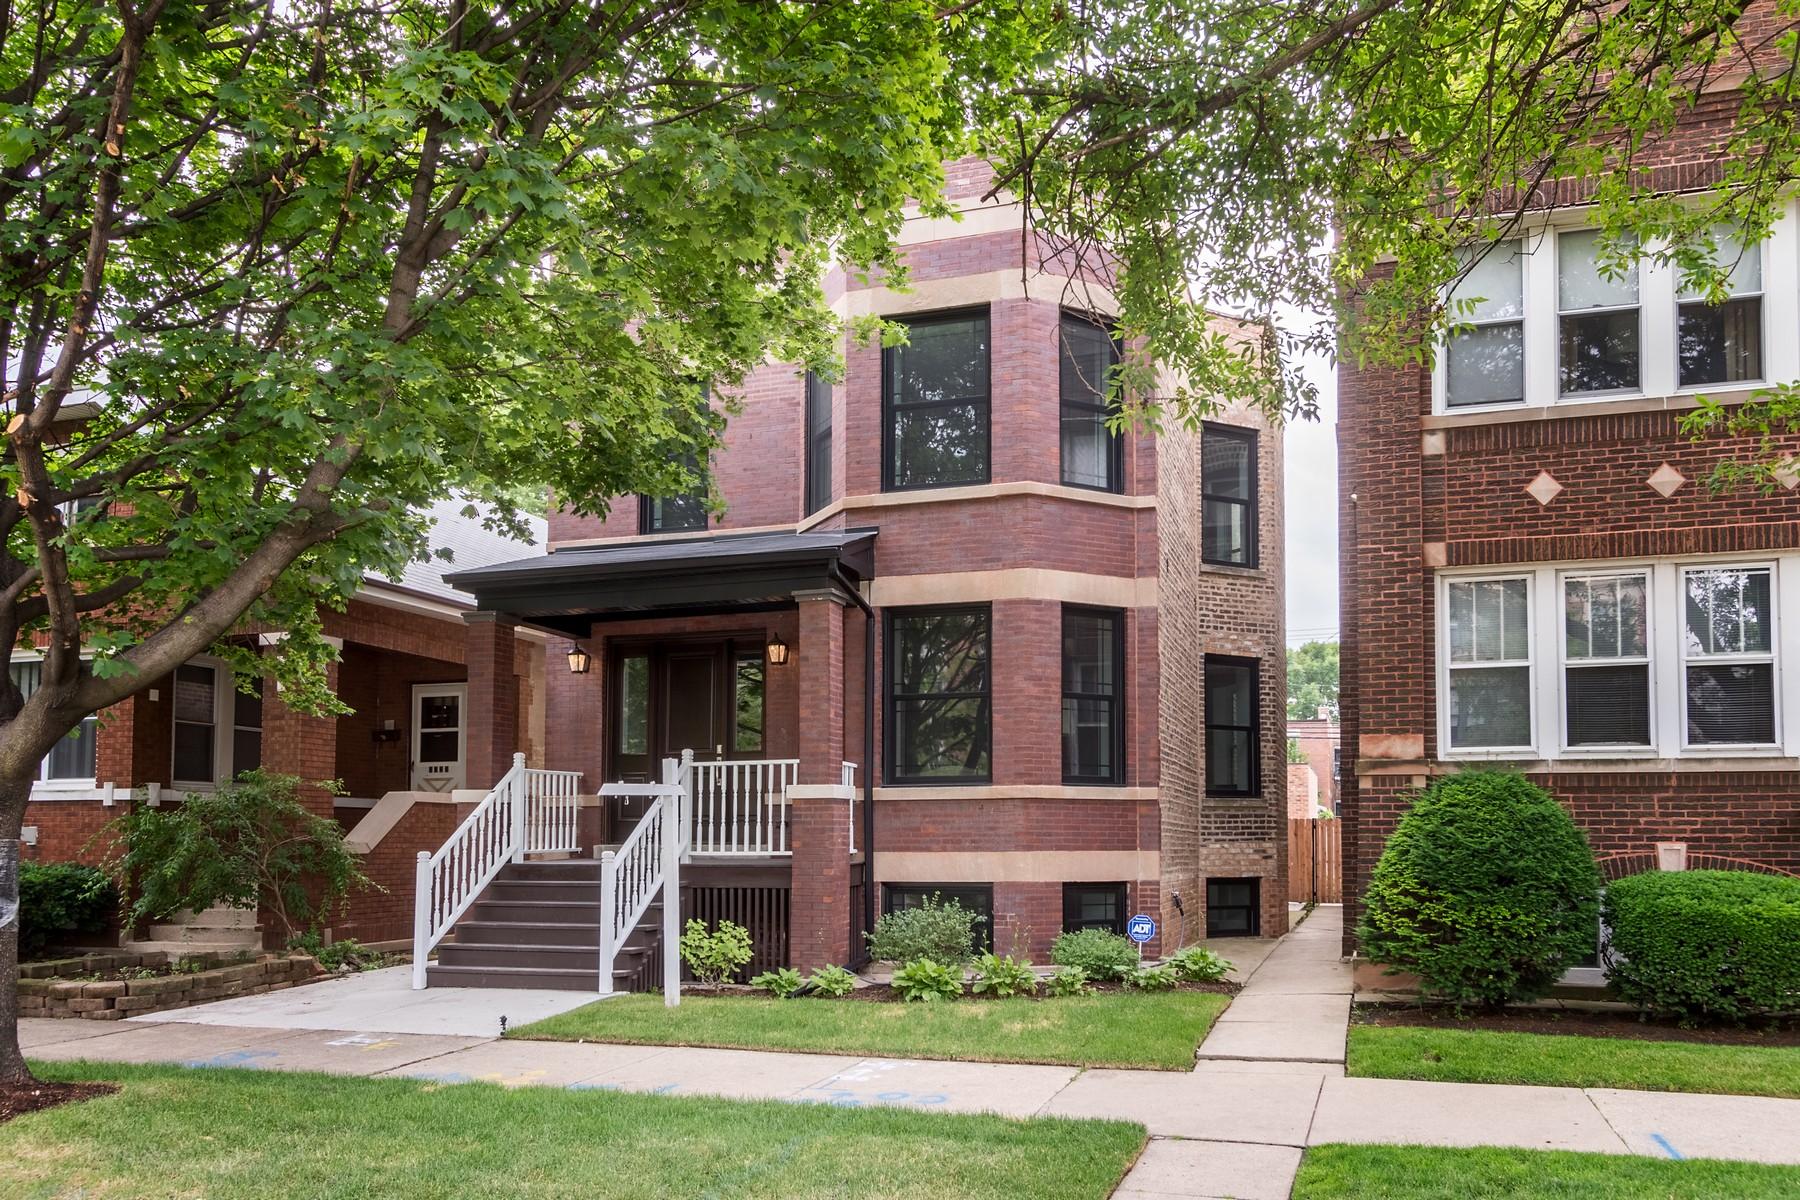 獨棟家庭住宅 為 出售 在 Brand New Home in North Center 3719 N Oakley Avenue Chicago, 伊利諾斯州, 60618 美國